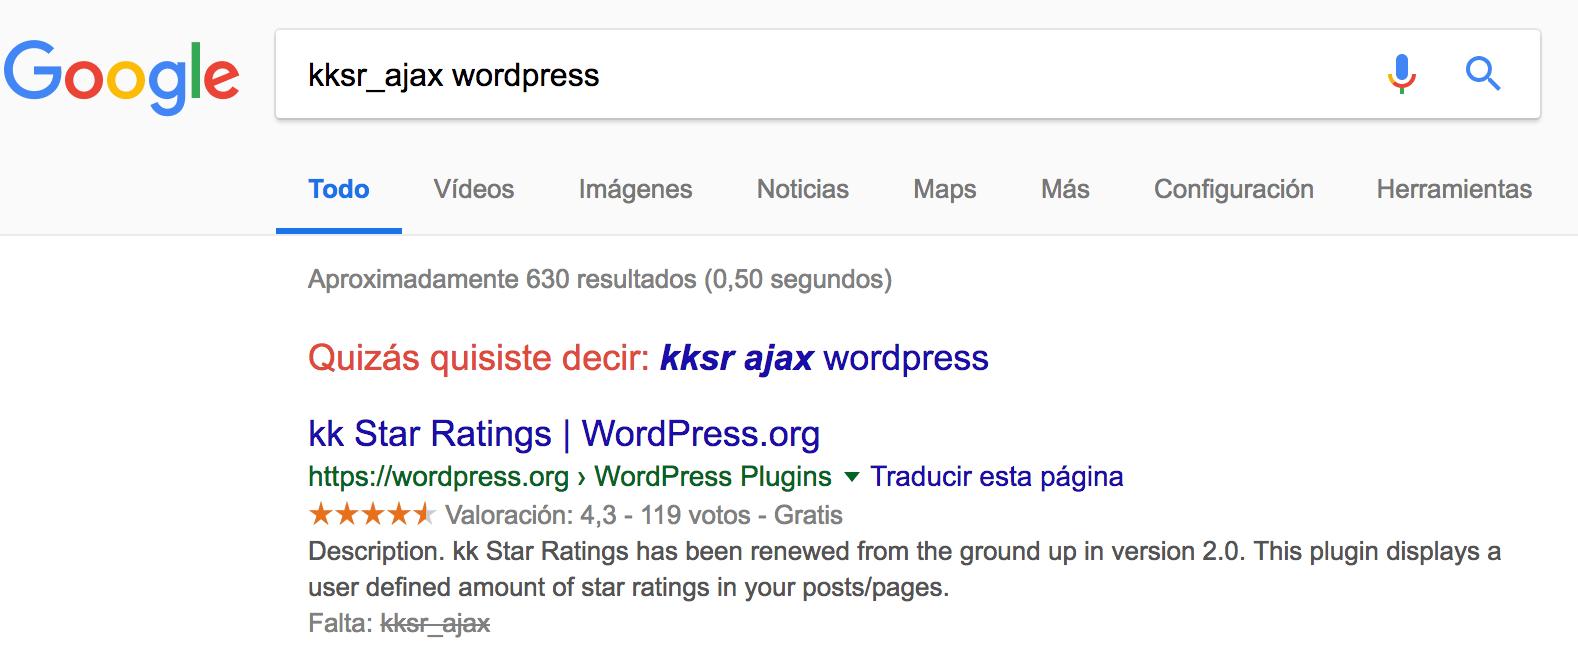 Búsqueda en Google de kksr_ajax